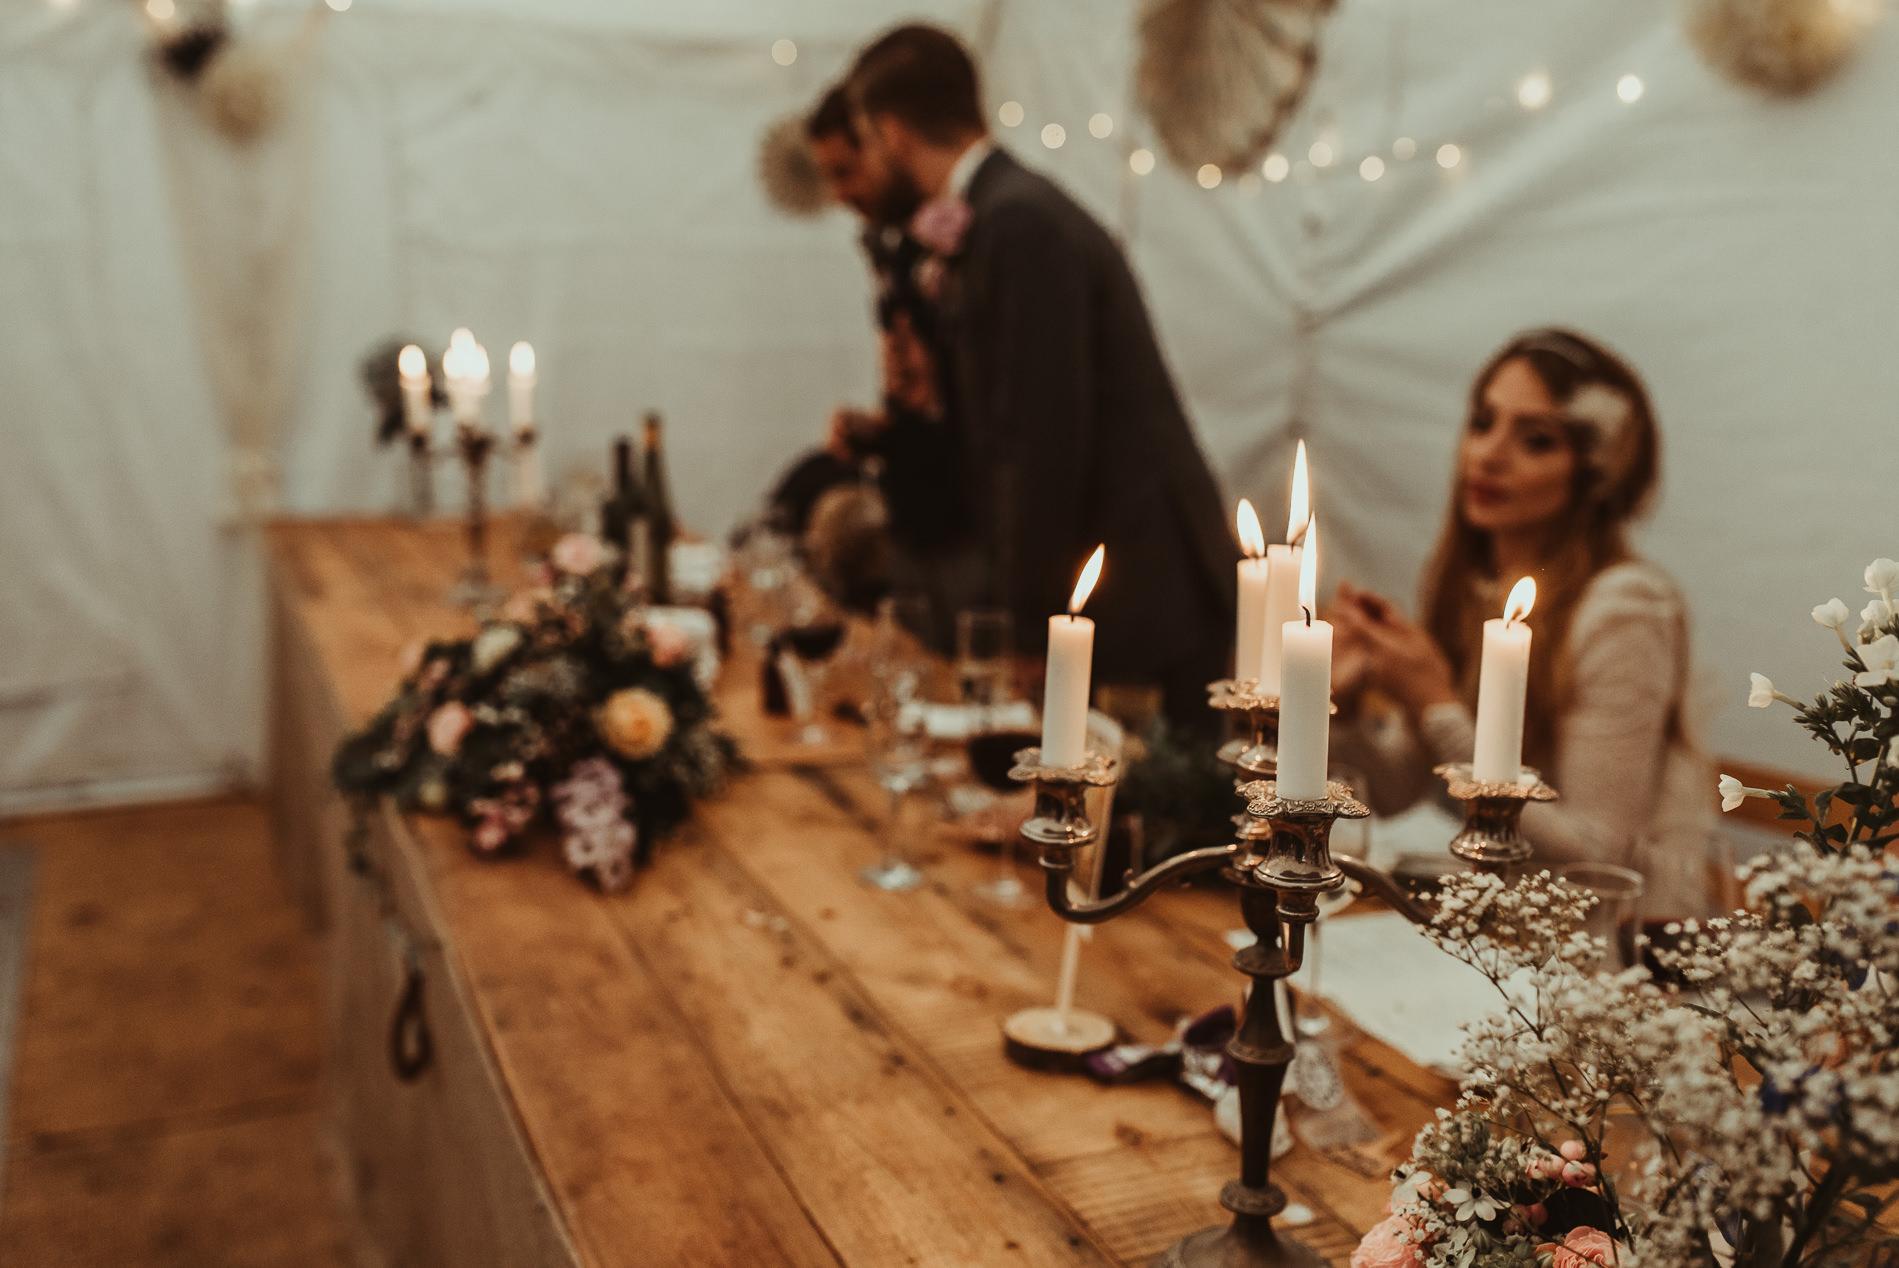 bohemian_wedding_lawshall_church_garden119